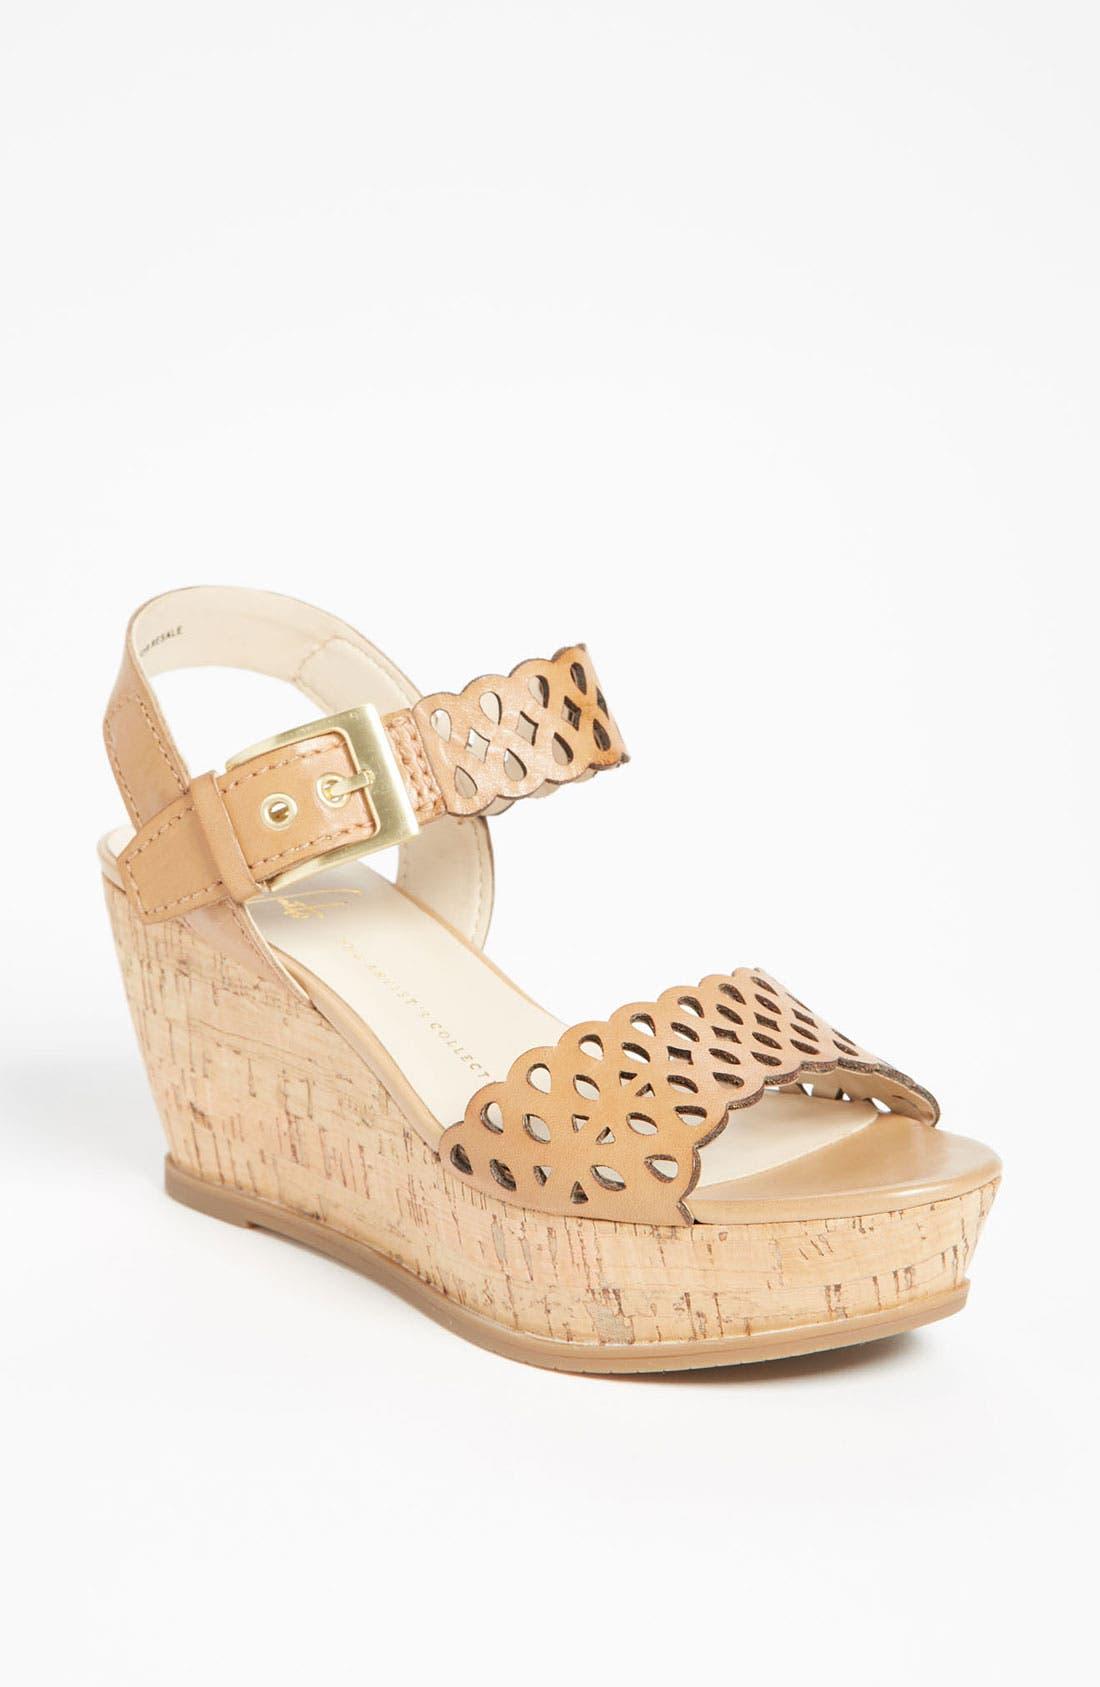 Alternate Image 1 Selected - Franco Sarto 'Fern' Sandal